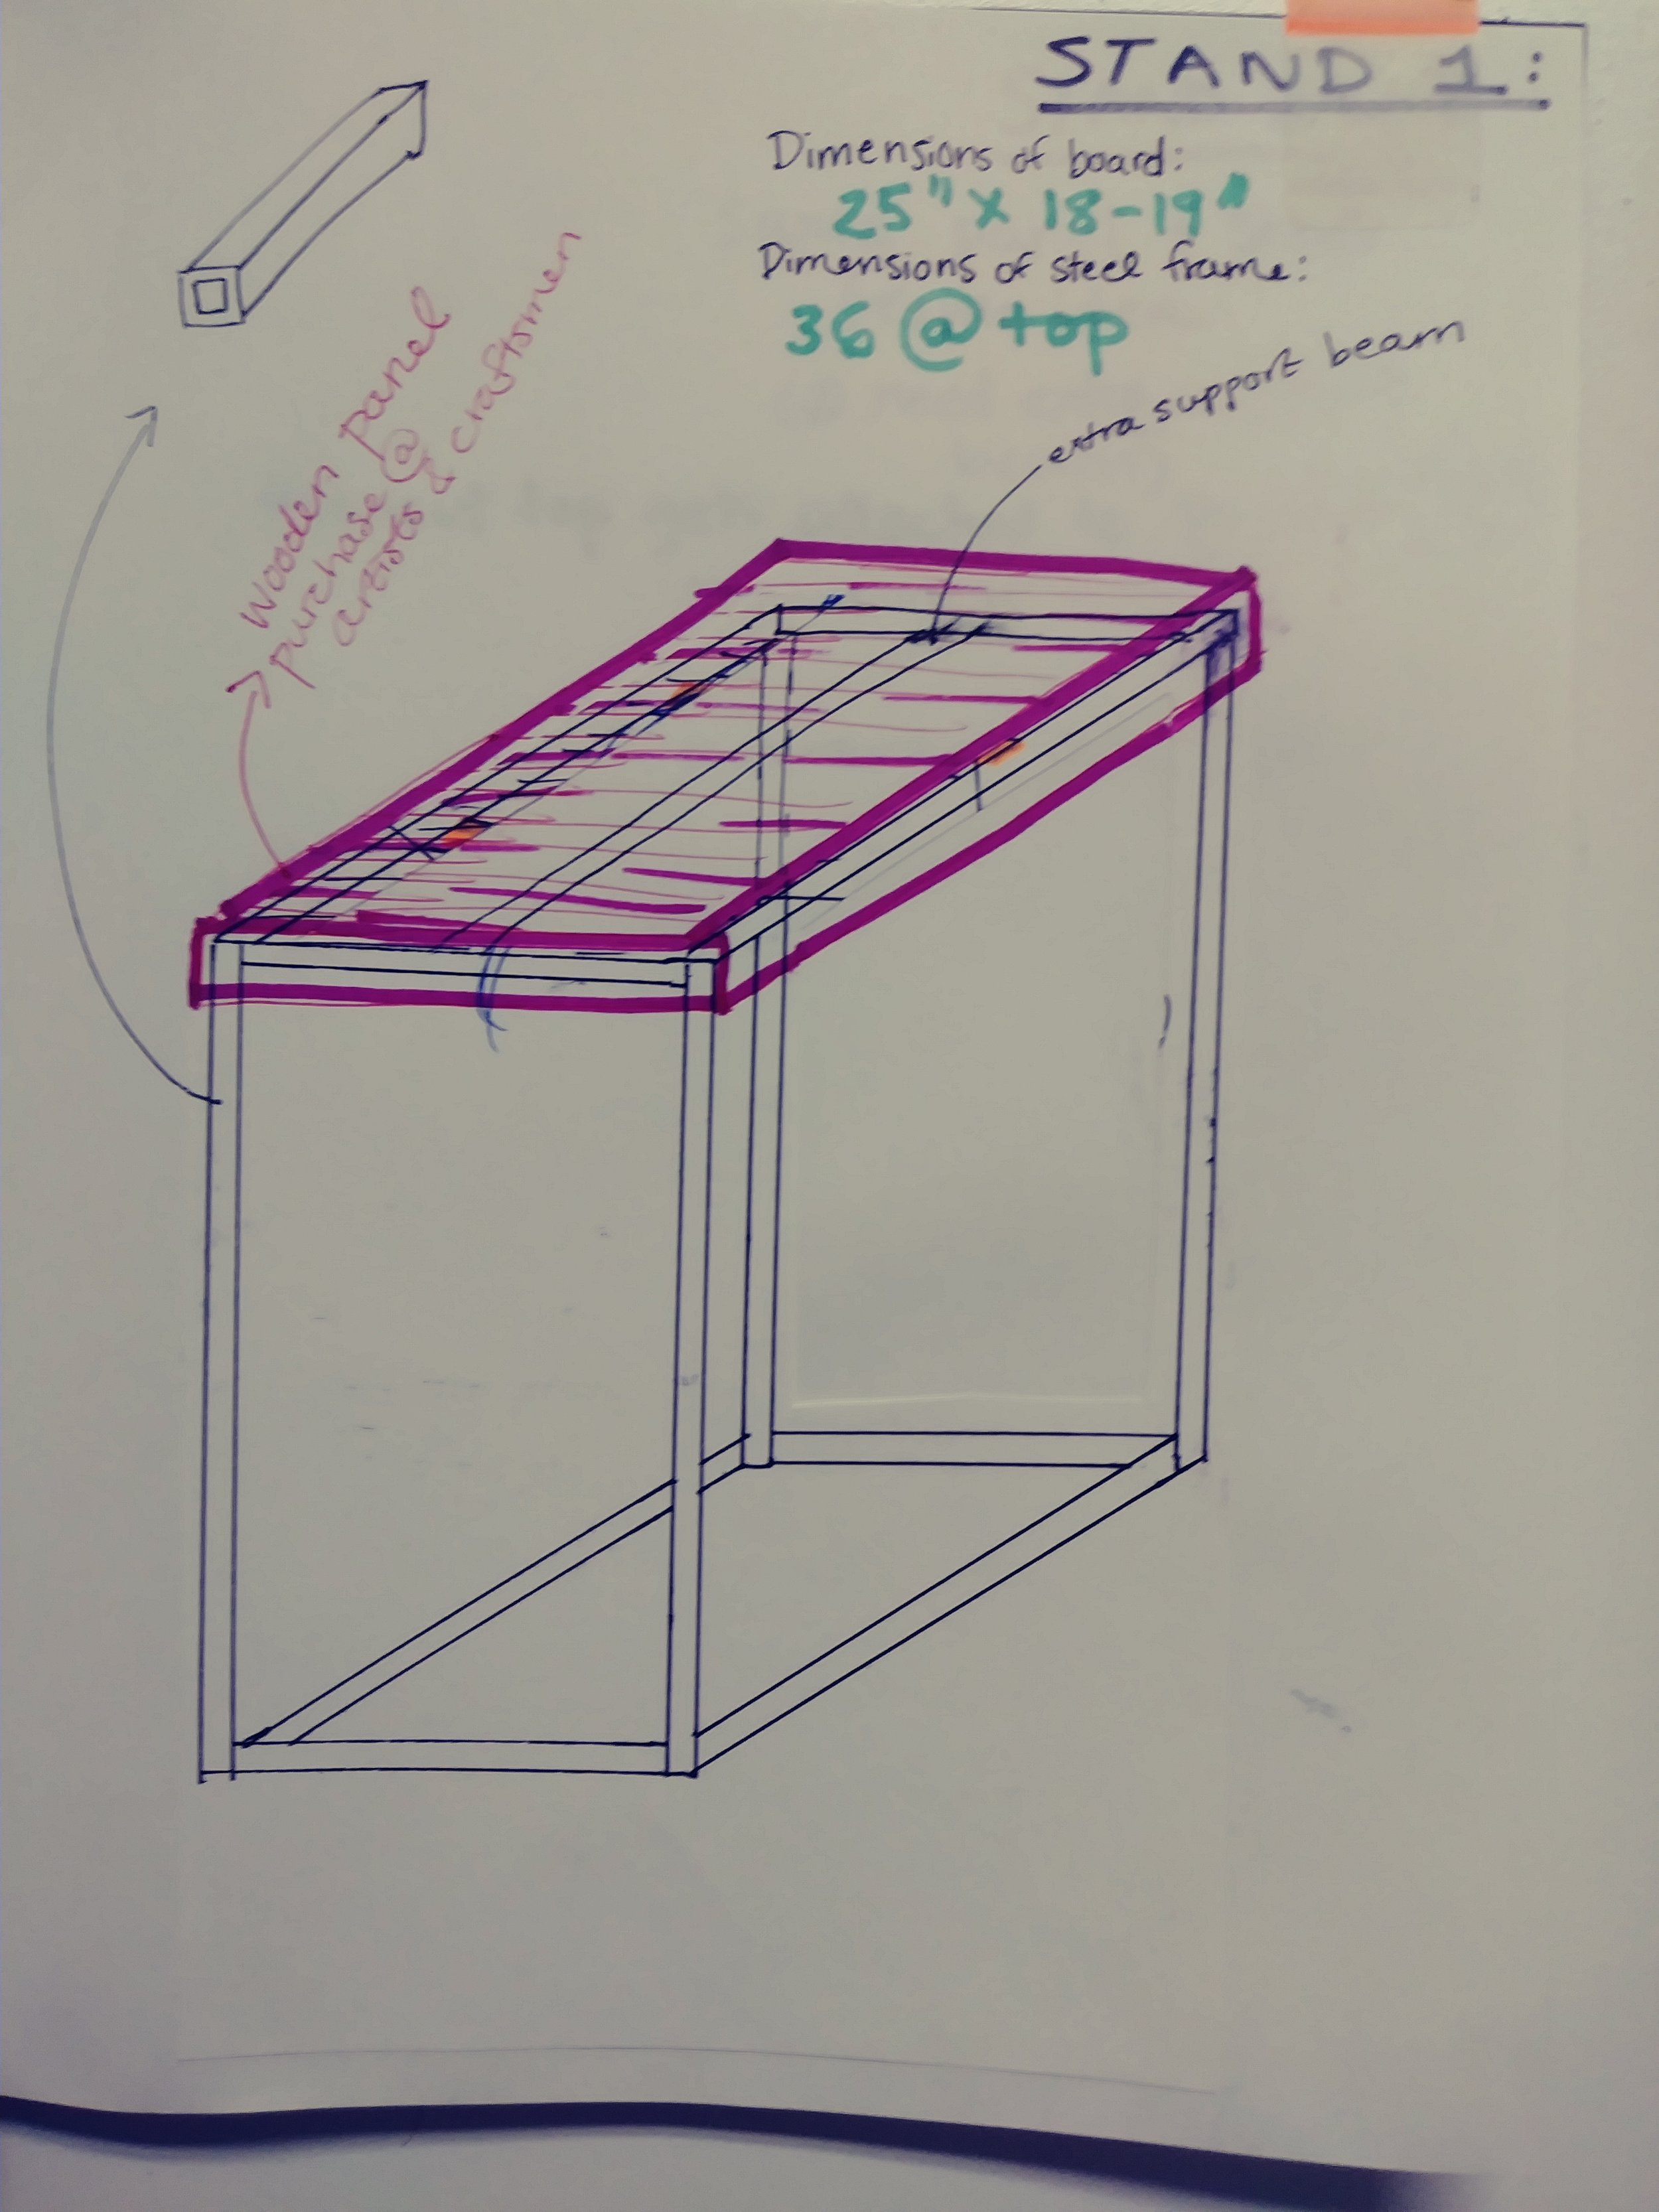 Hand-drawn-plans-for-art-pedestal.jpg